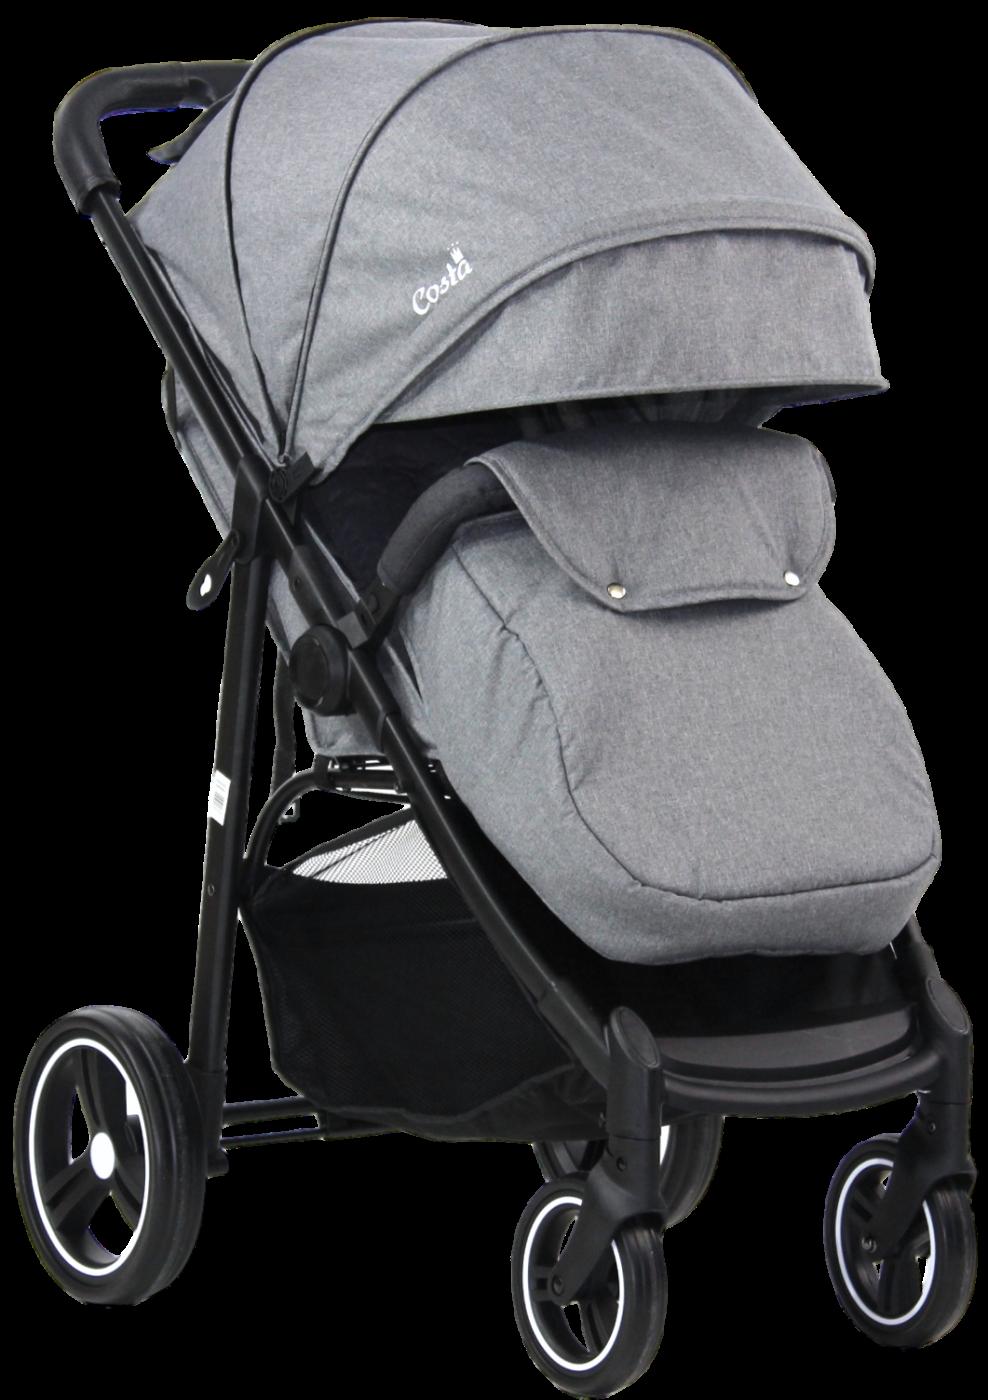 Прогулочная коляска COSTA Jenny Grey - серый